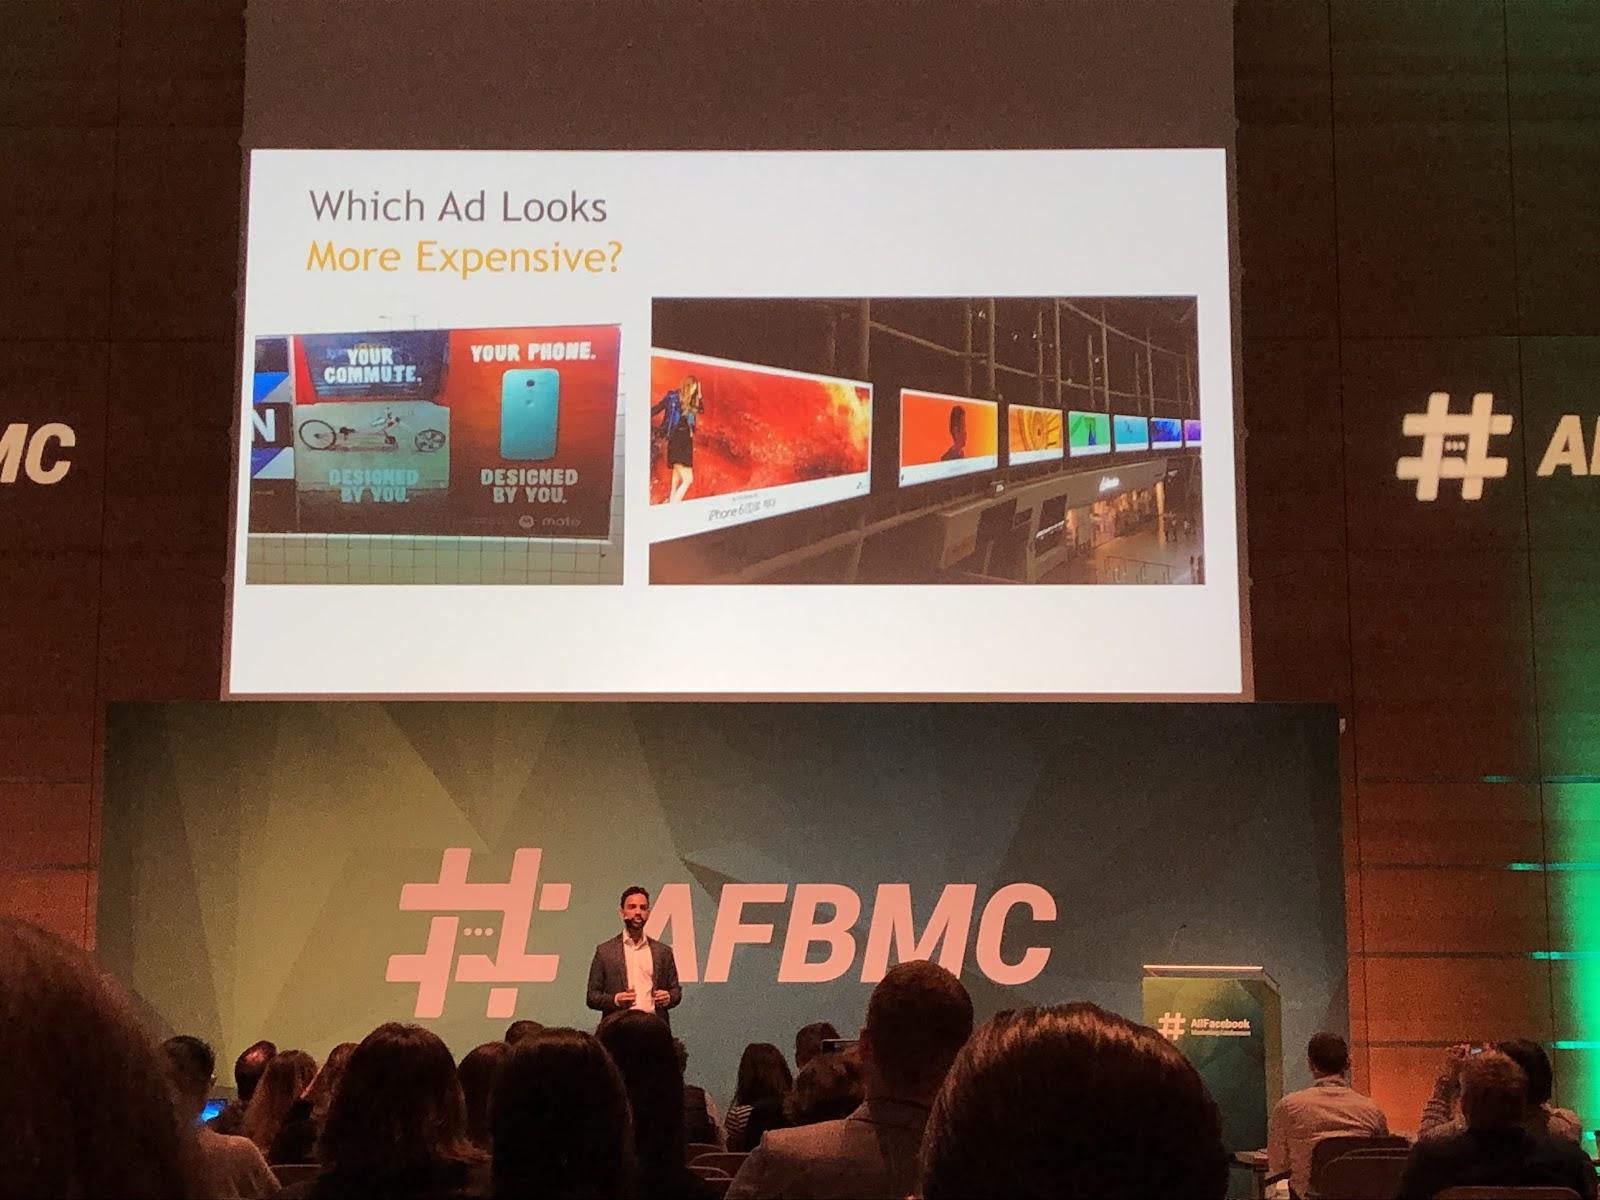 AFBMC Expensive LinkedIn